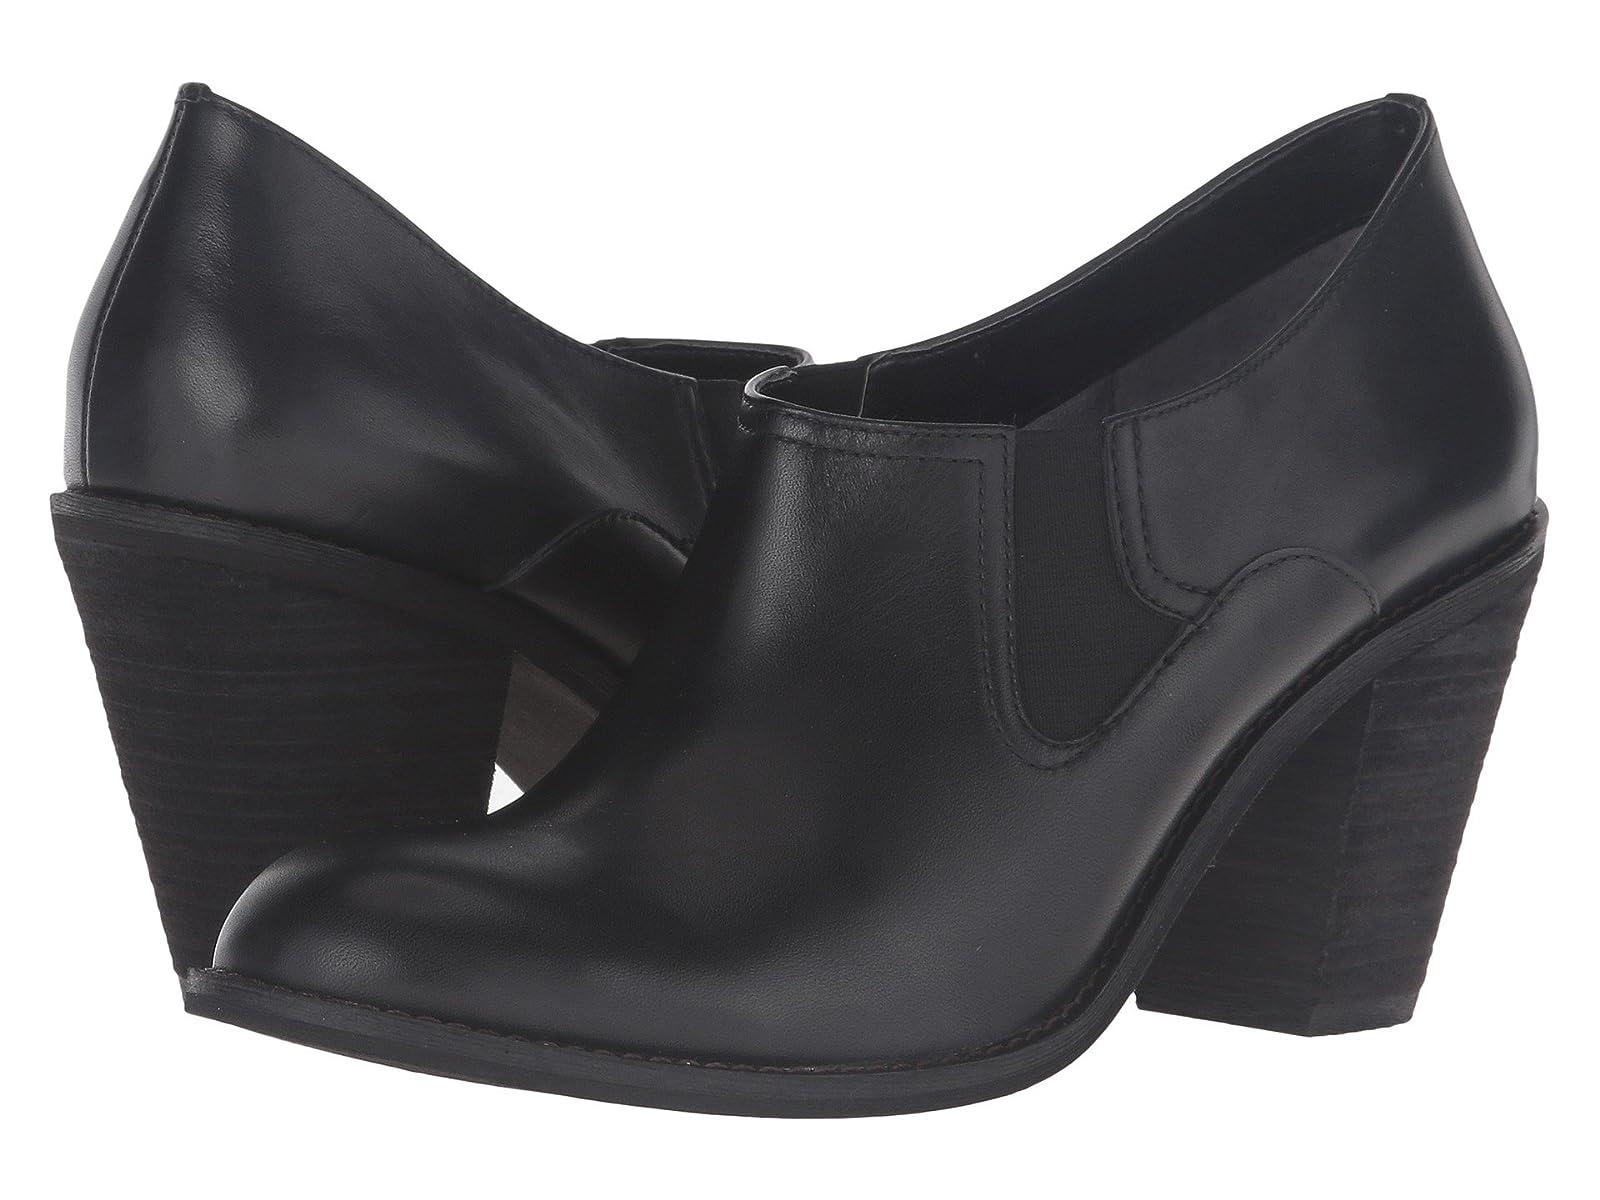 SoftWalk FargoCheap and distinctive eye-catching shoes